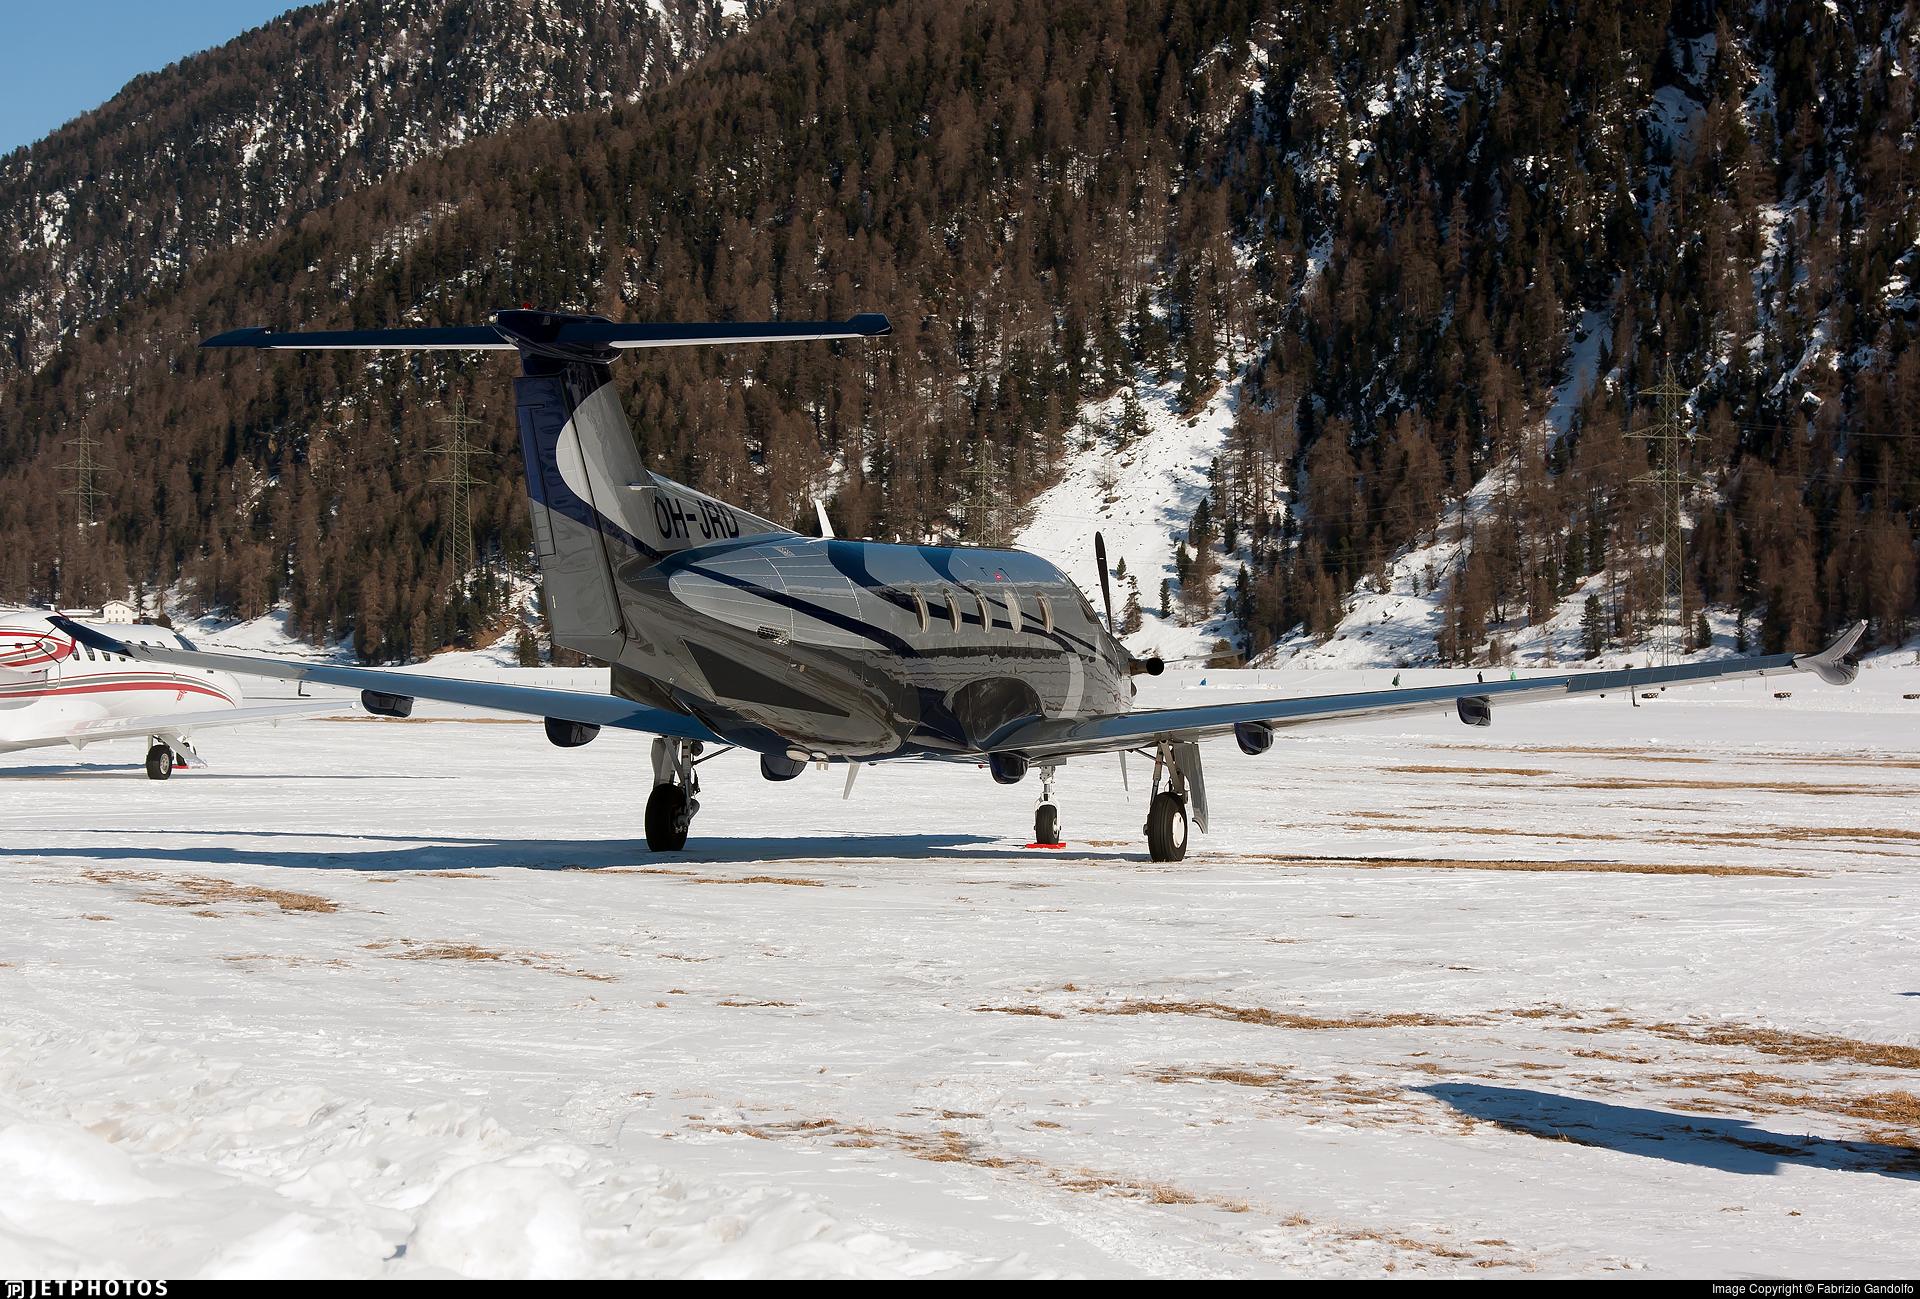 OH-JRD - Pilatus PC-12/47E - Private